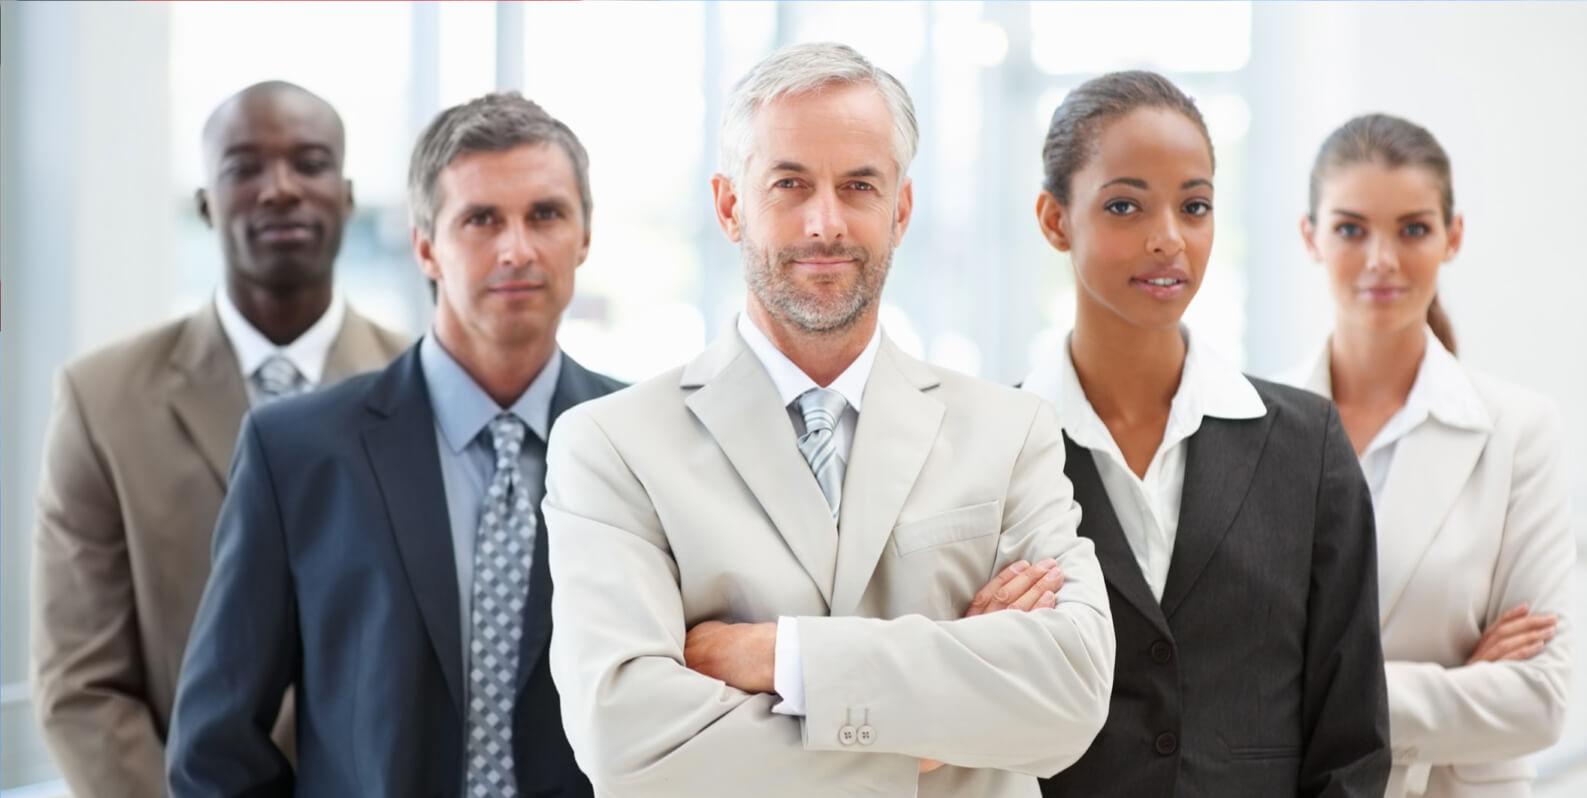 statswork business_people_uk